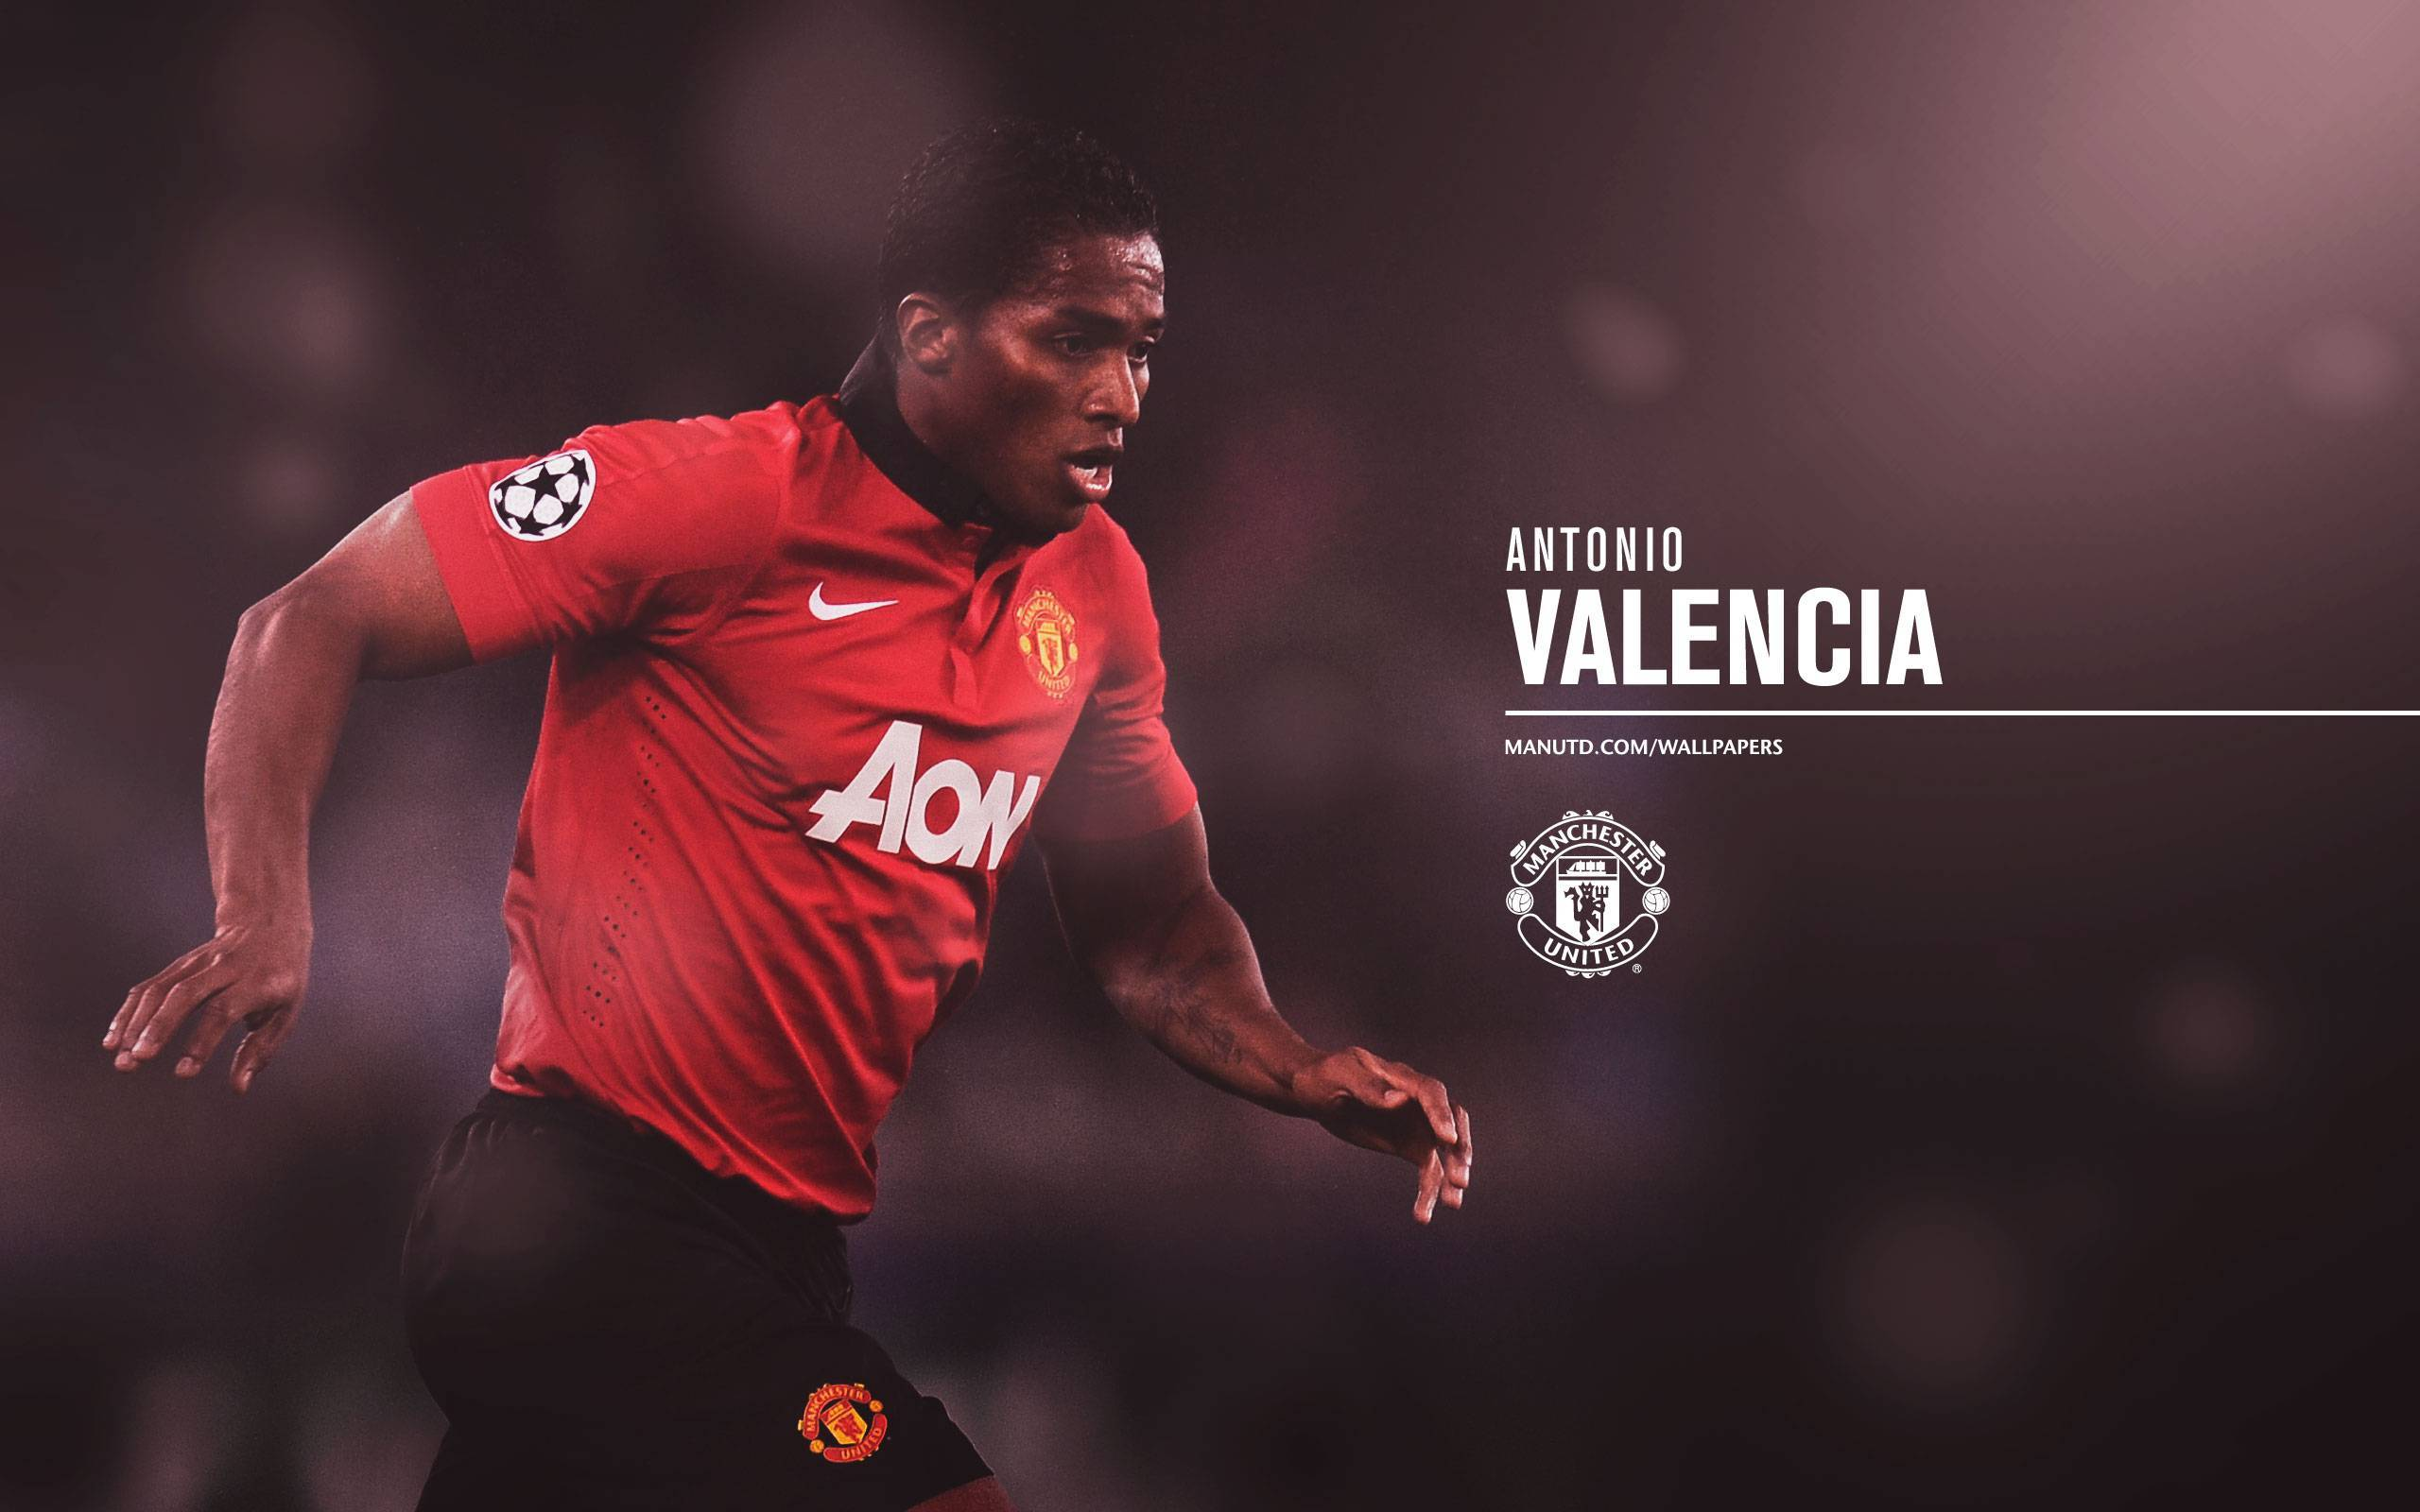 Antonio Valencia Manchester United Wallpaper Hd Antonio